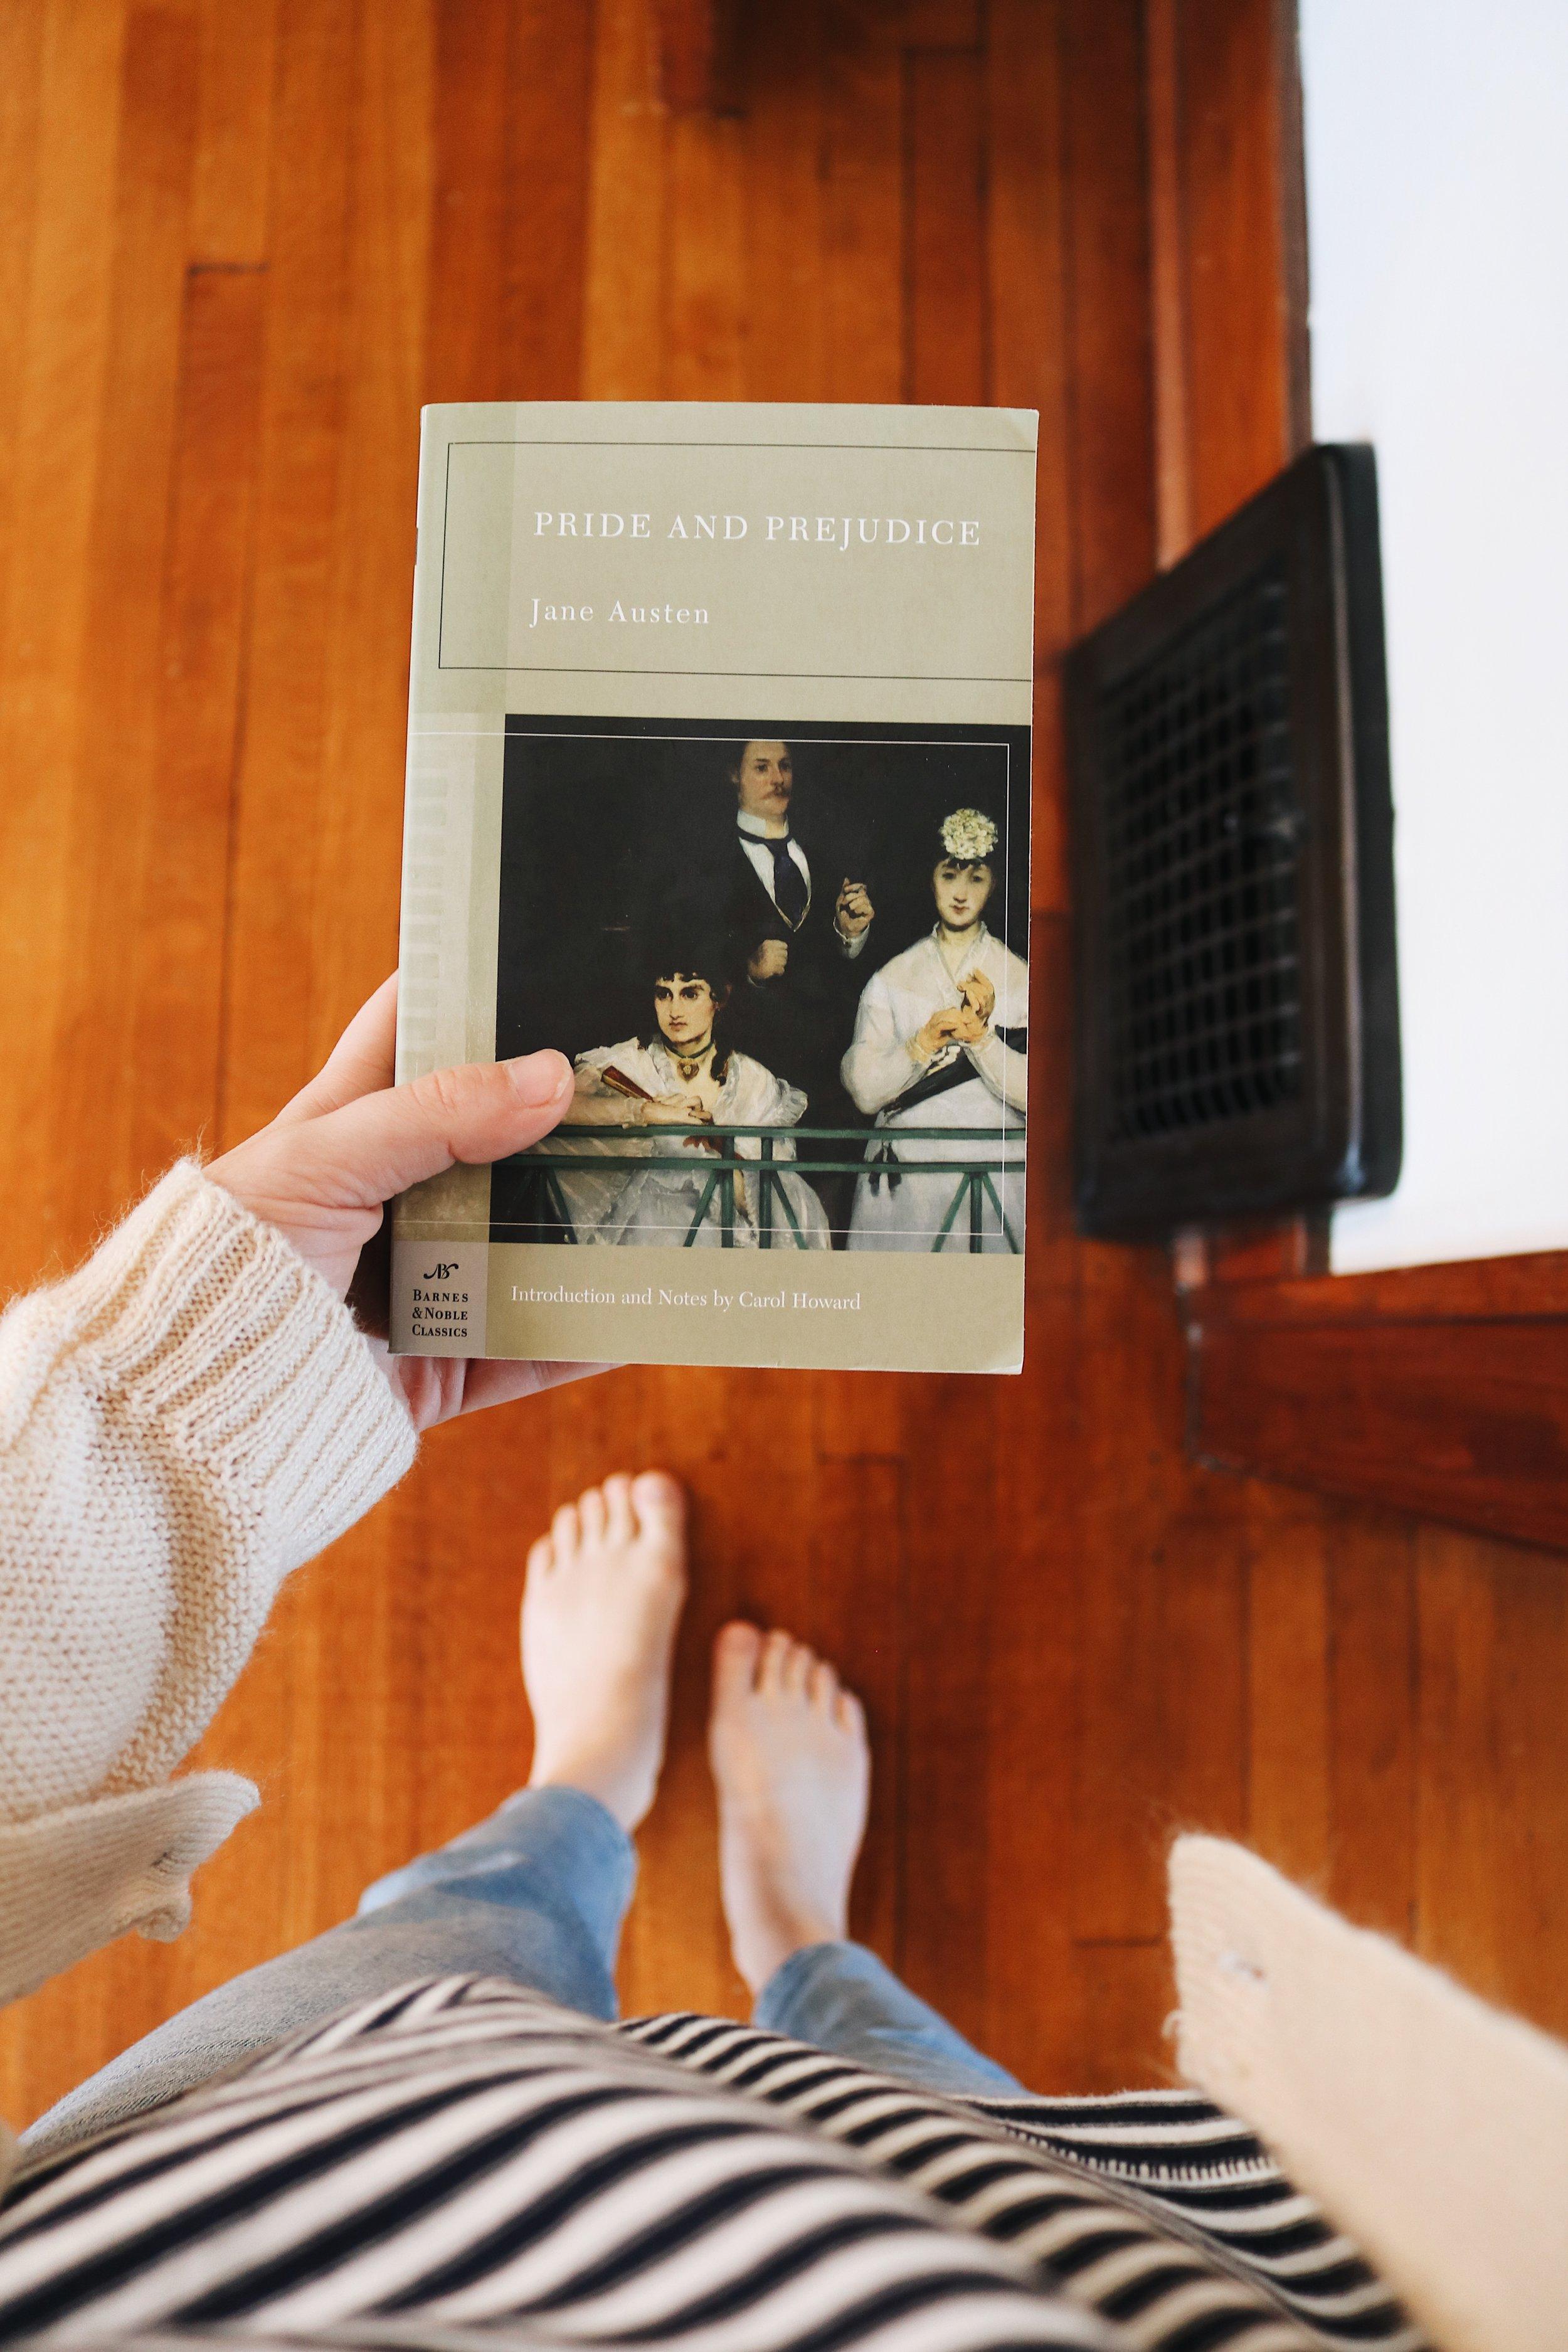 UATR Book Club | Pride and Prejudice Discussion - Under A Tin Roof Blog